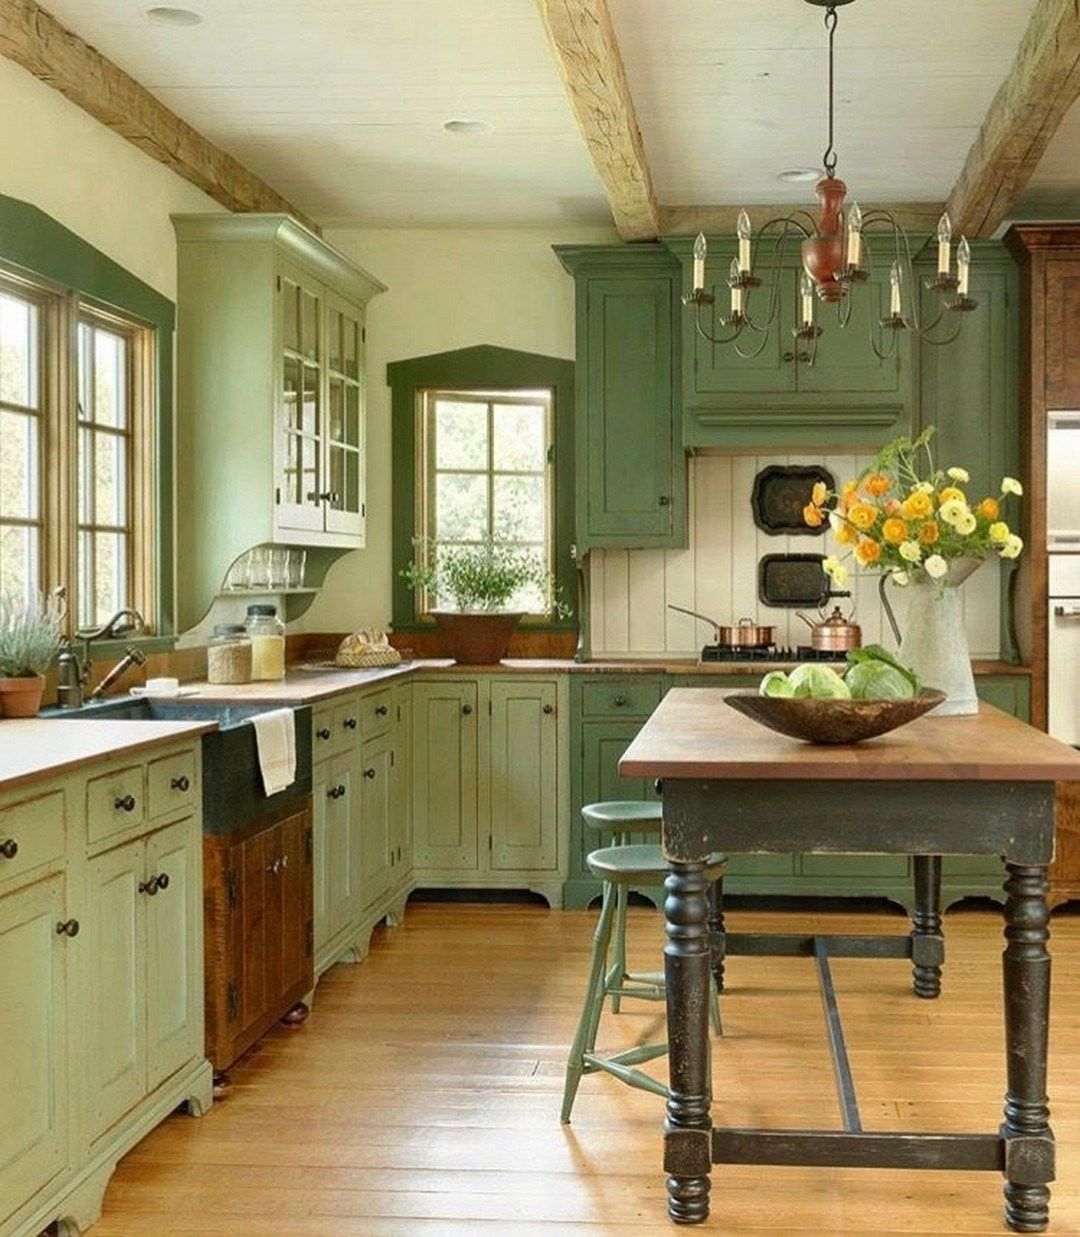 51 Green Kitchen Designs: 31 Popular Green Kitchen Cabinet Colors Ideas (11) In 2019